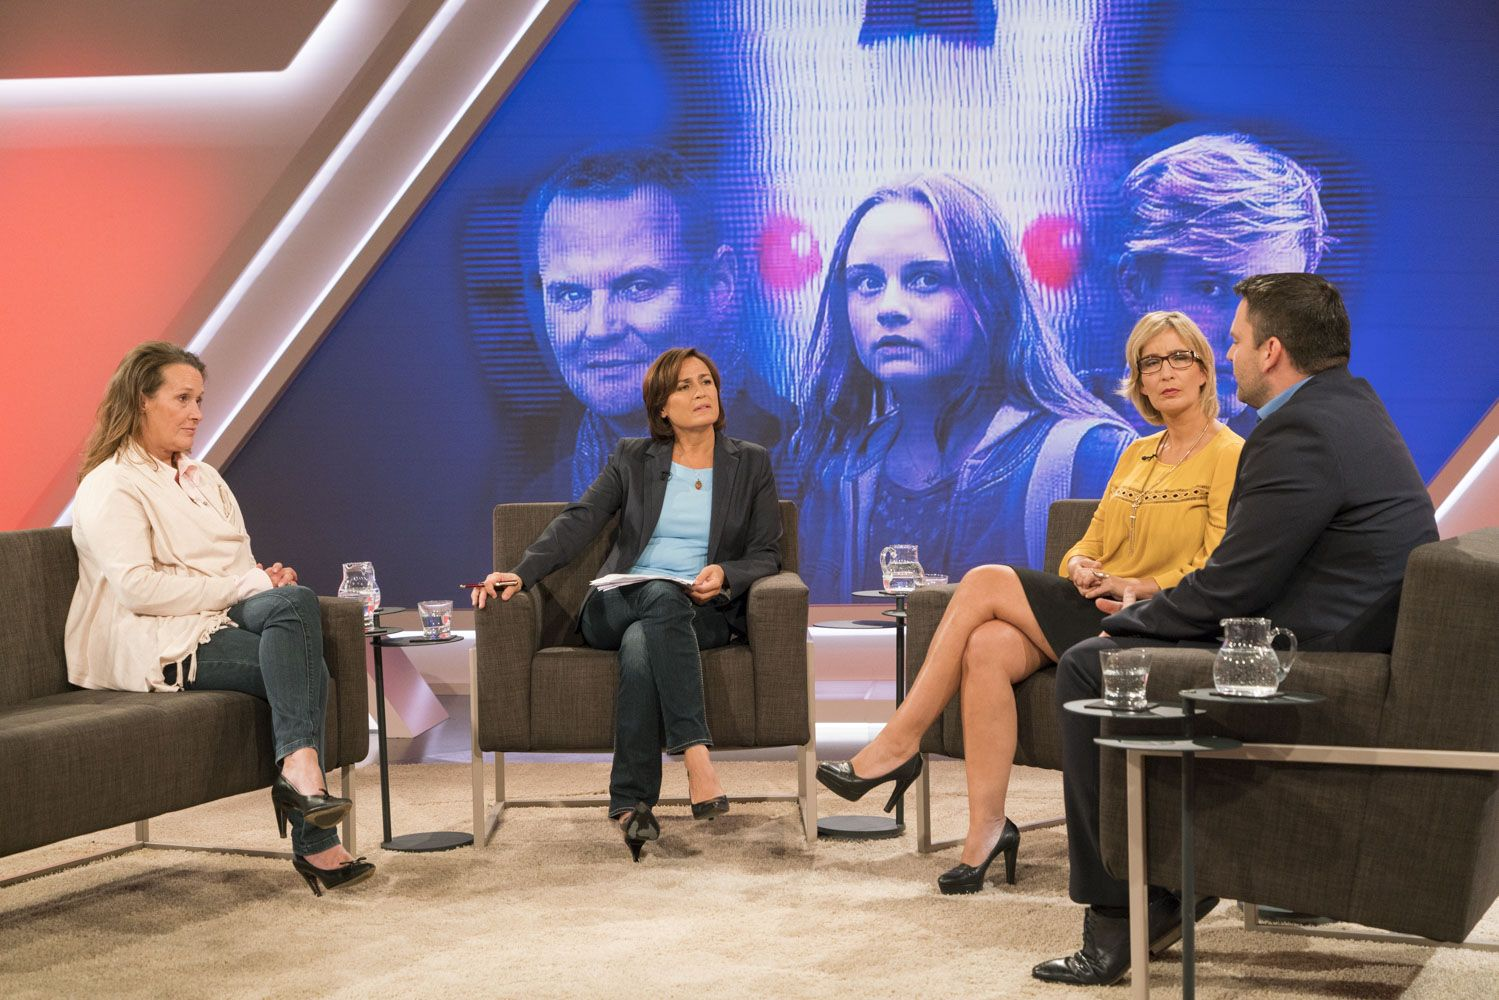 EINMALIGE VERWENDUNG Maischberger/ Sendung 28.09.2016